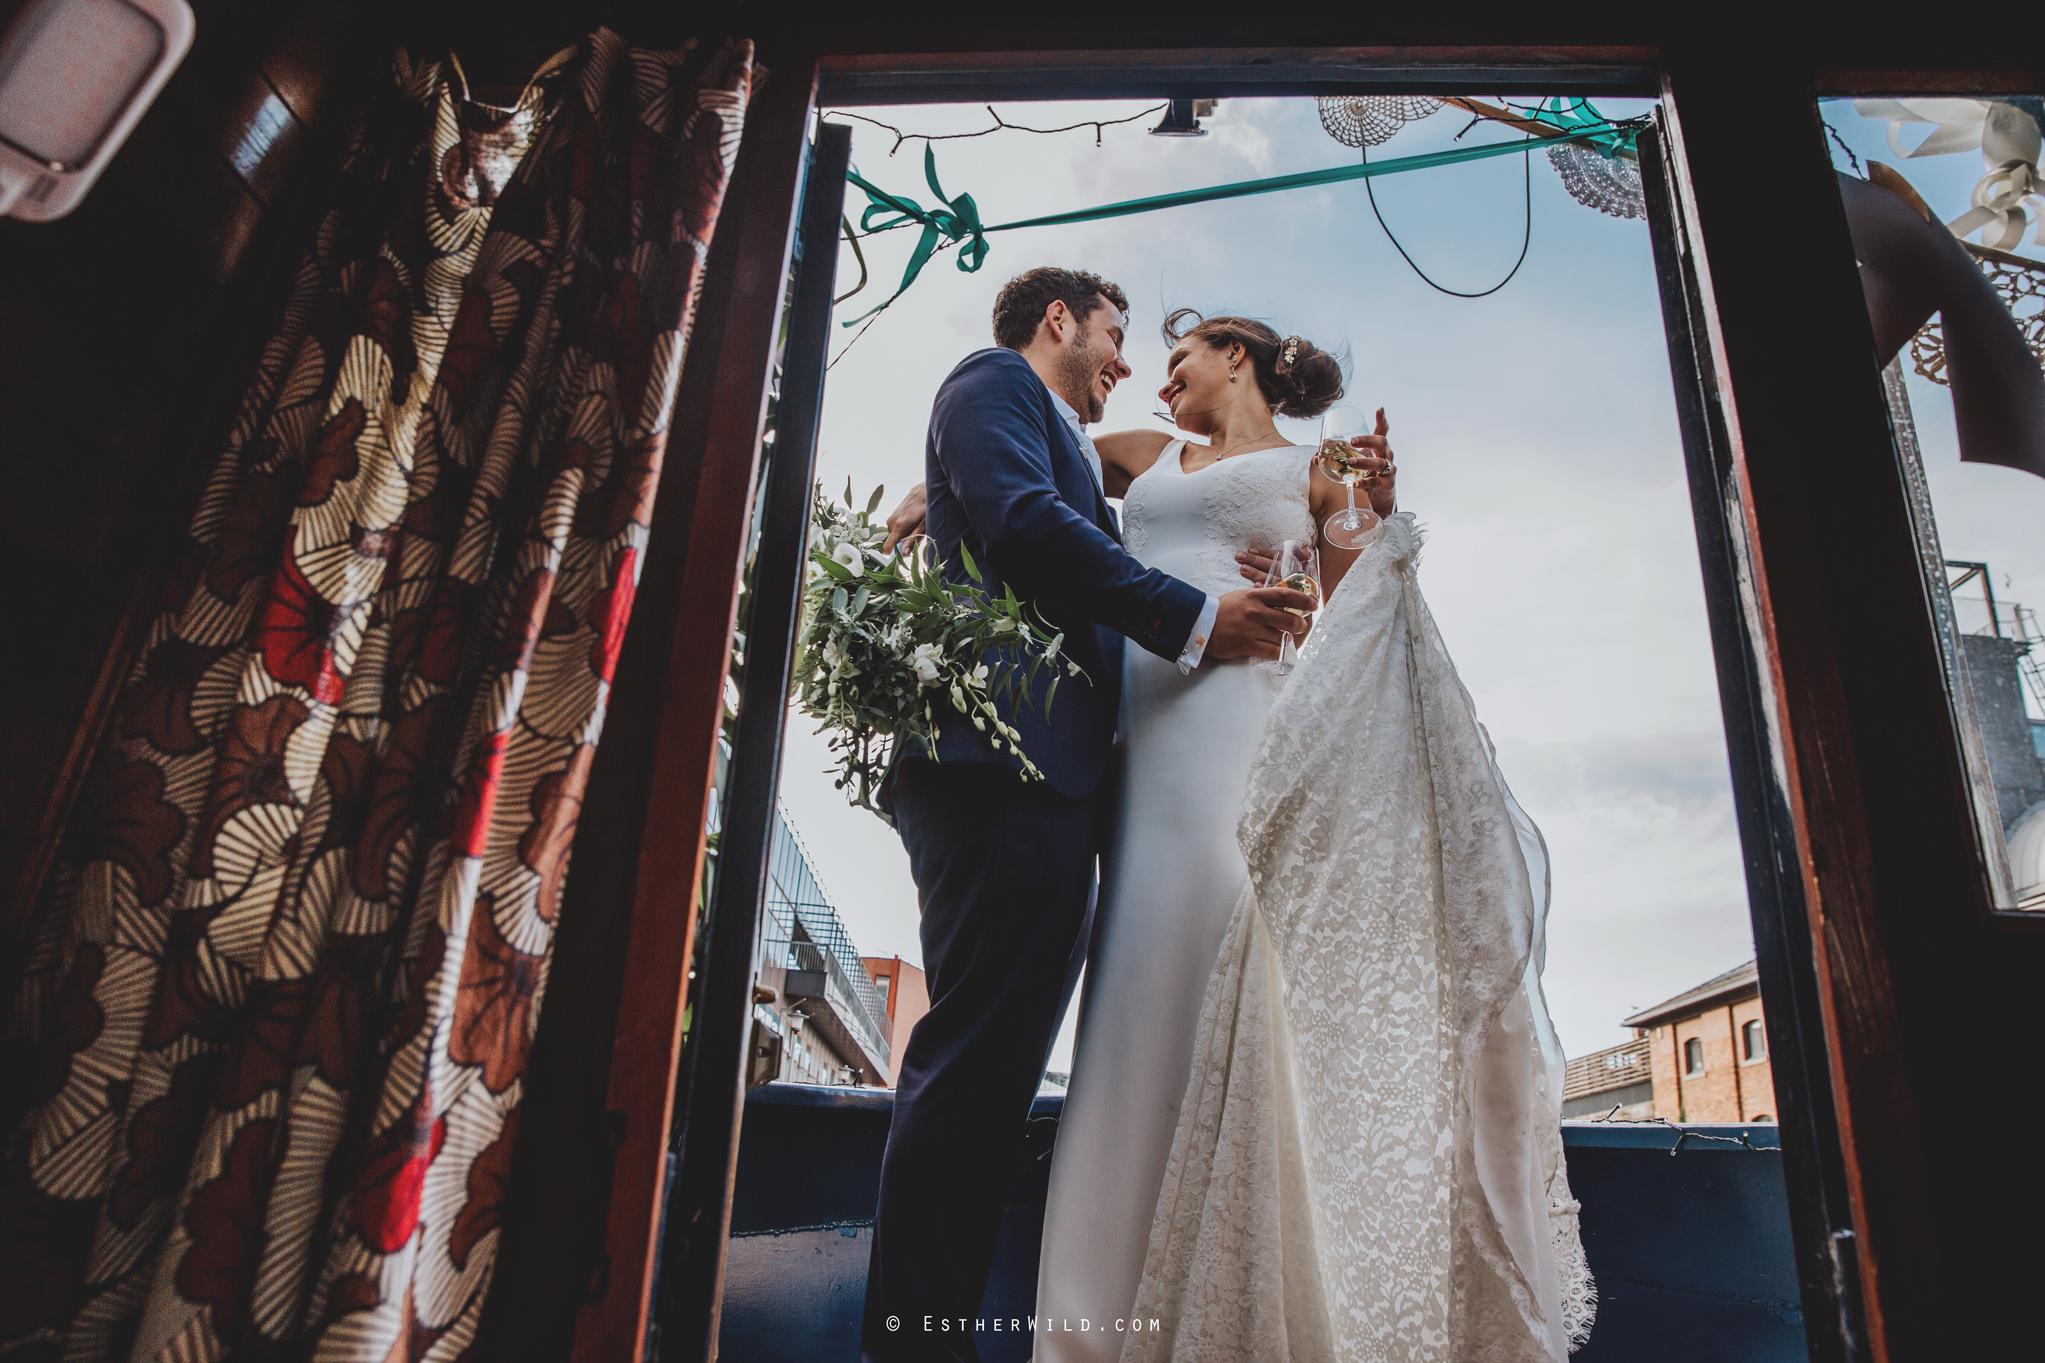 Islington_Town_Hall_Wedding_London_Photographer_Esther_Wild_IMG_6951-2.jpg